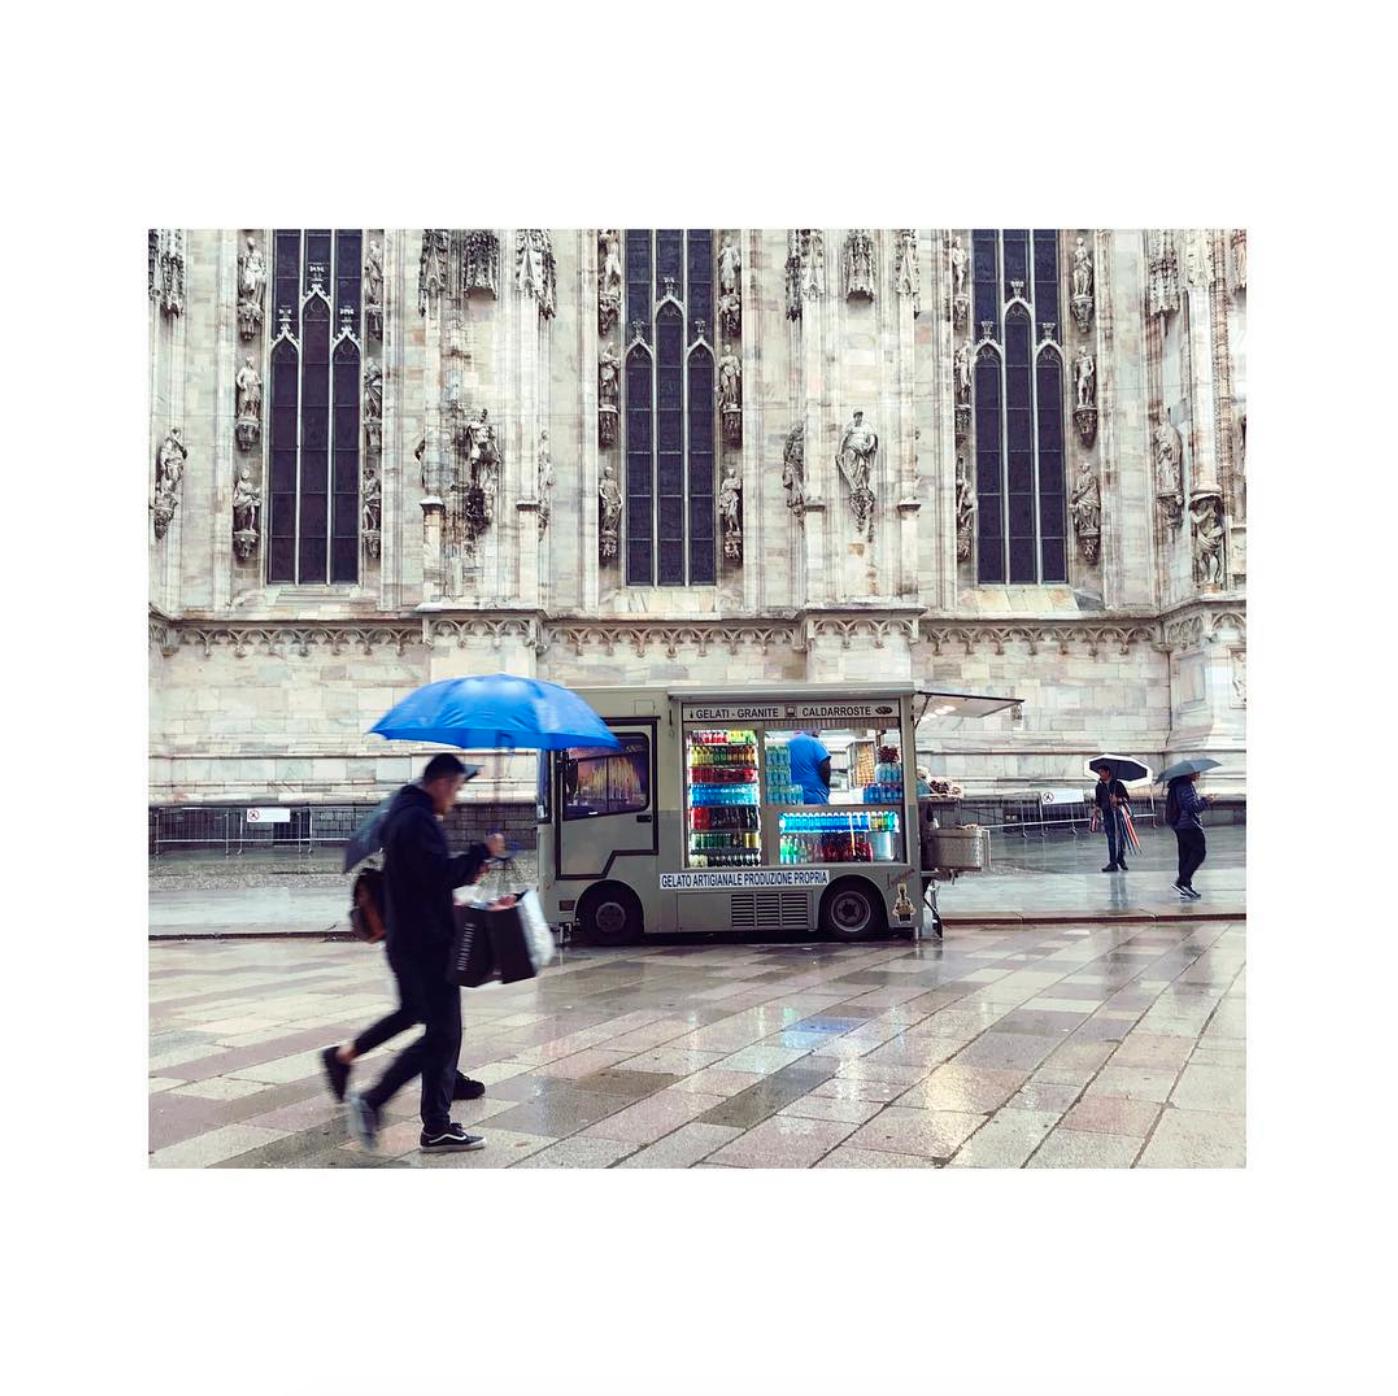 Piazza Duomo, Milan – Italy